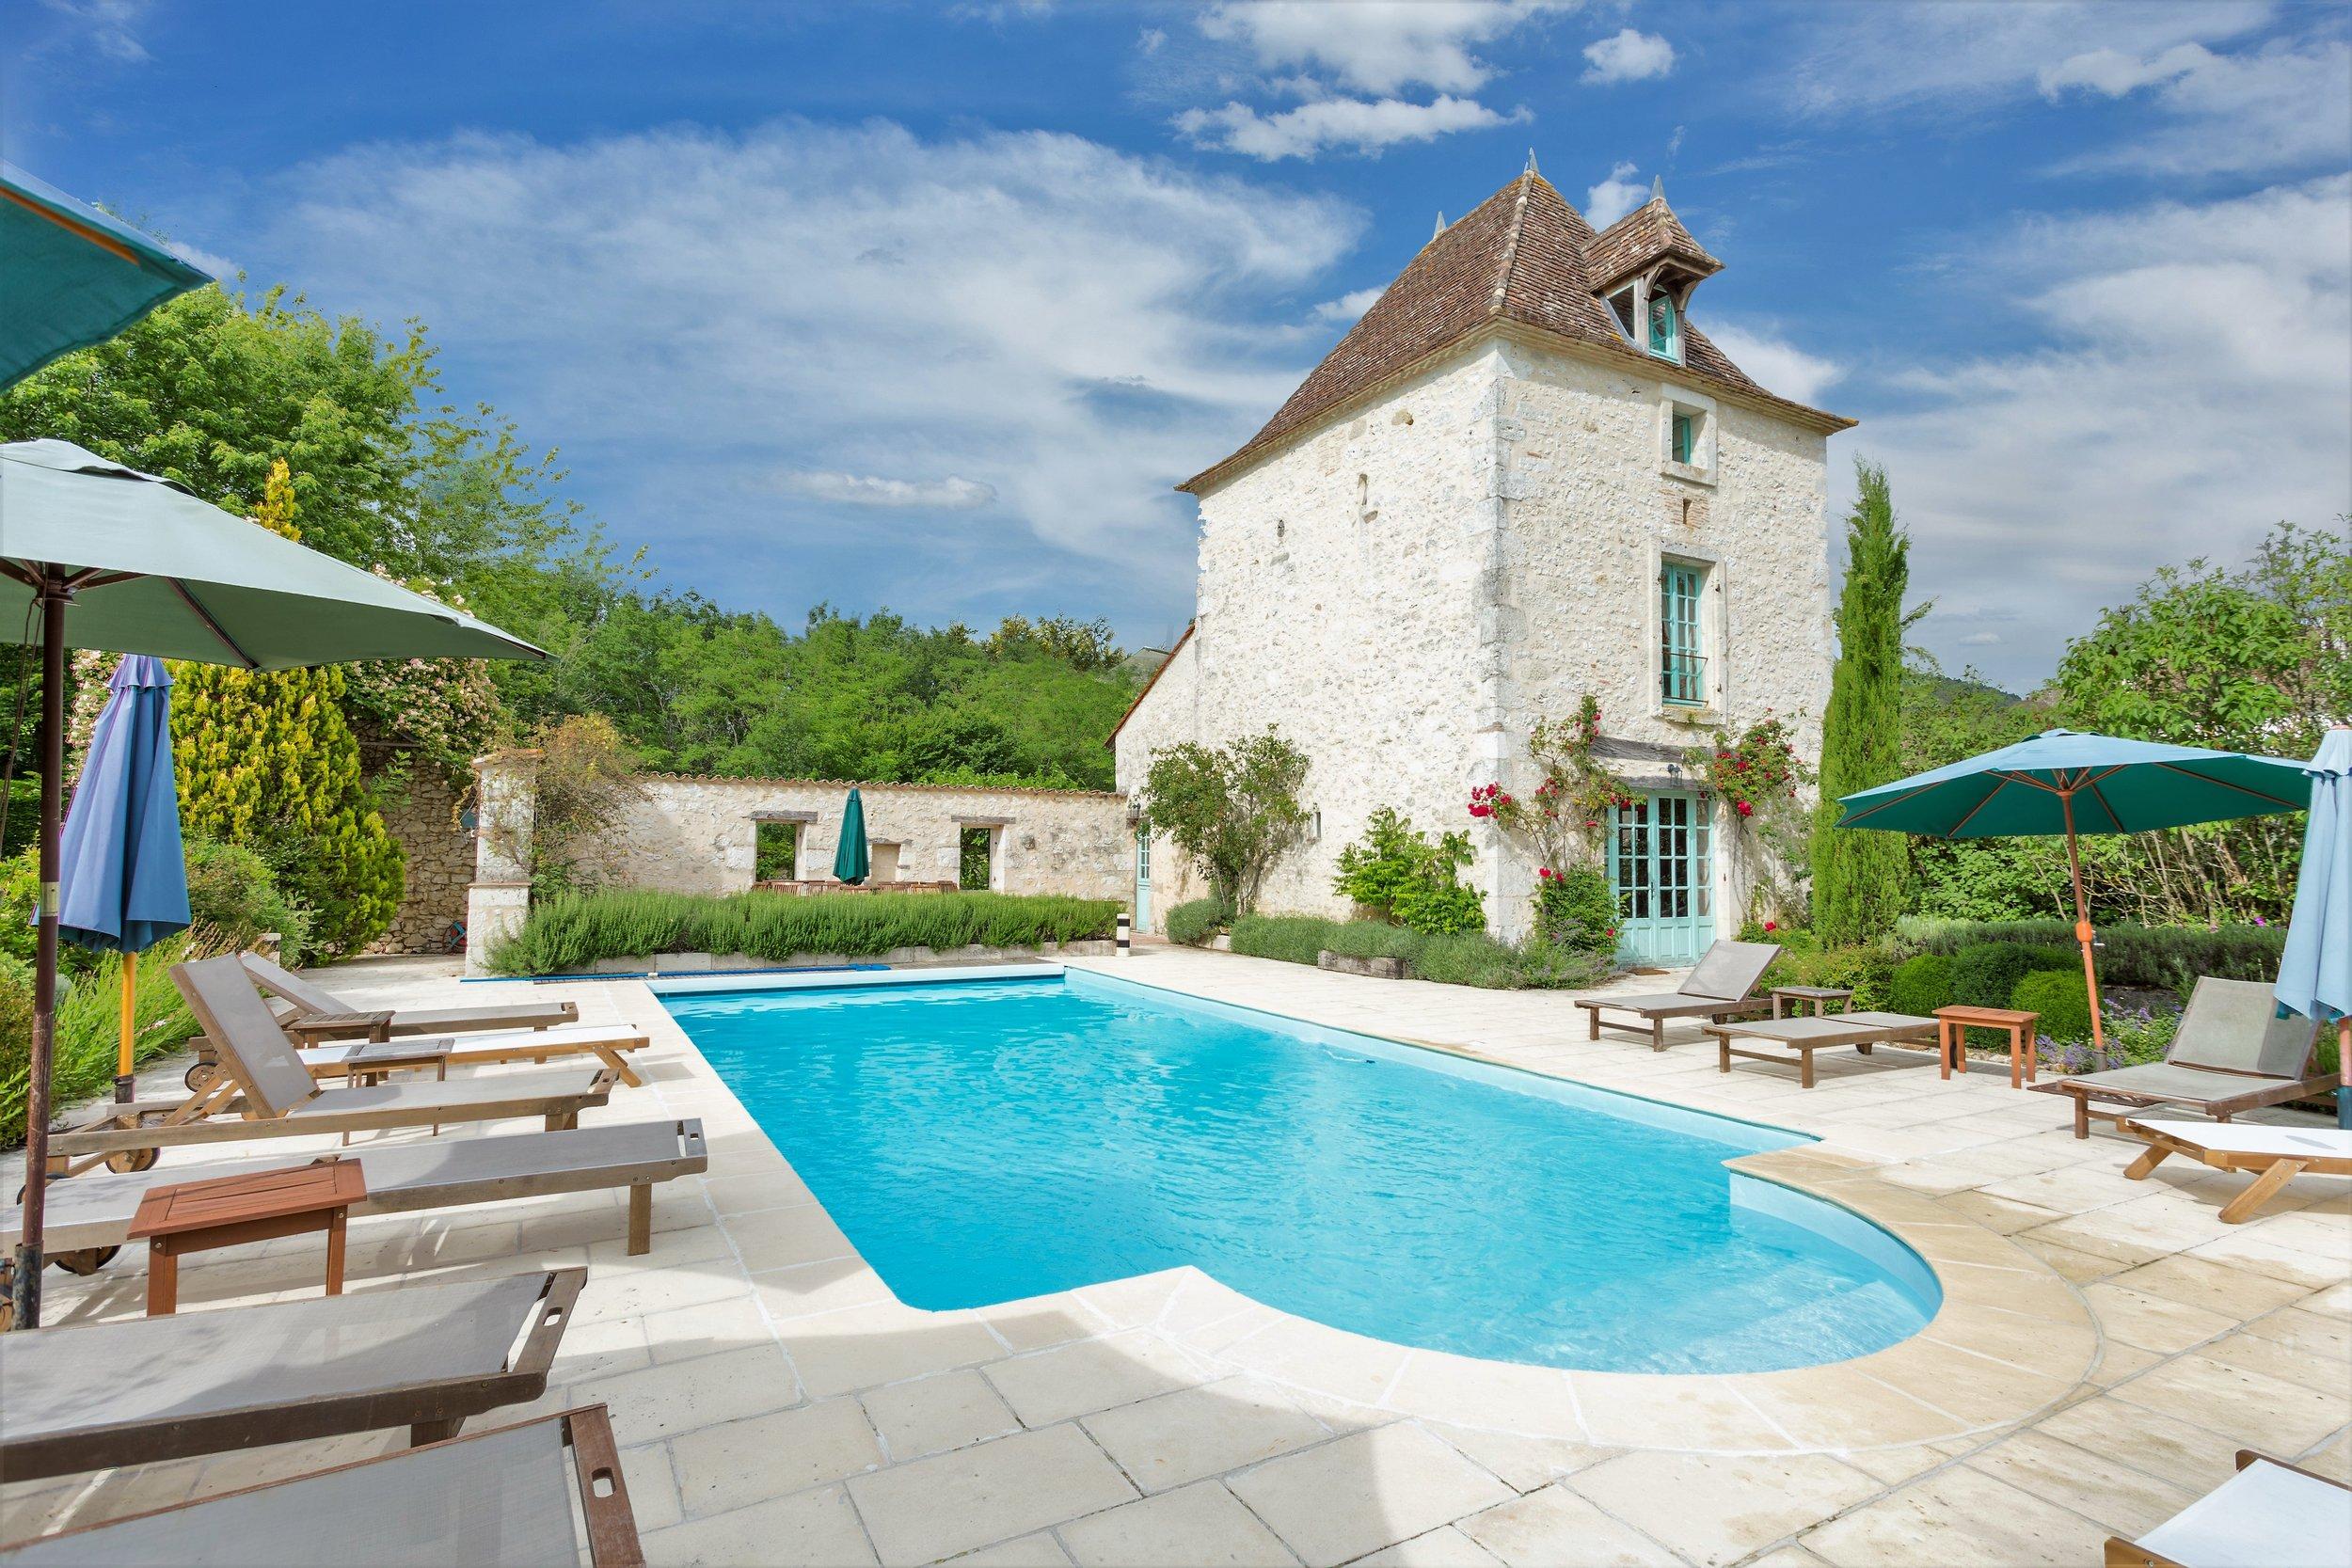 France Swimminmg Pool.jpg